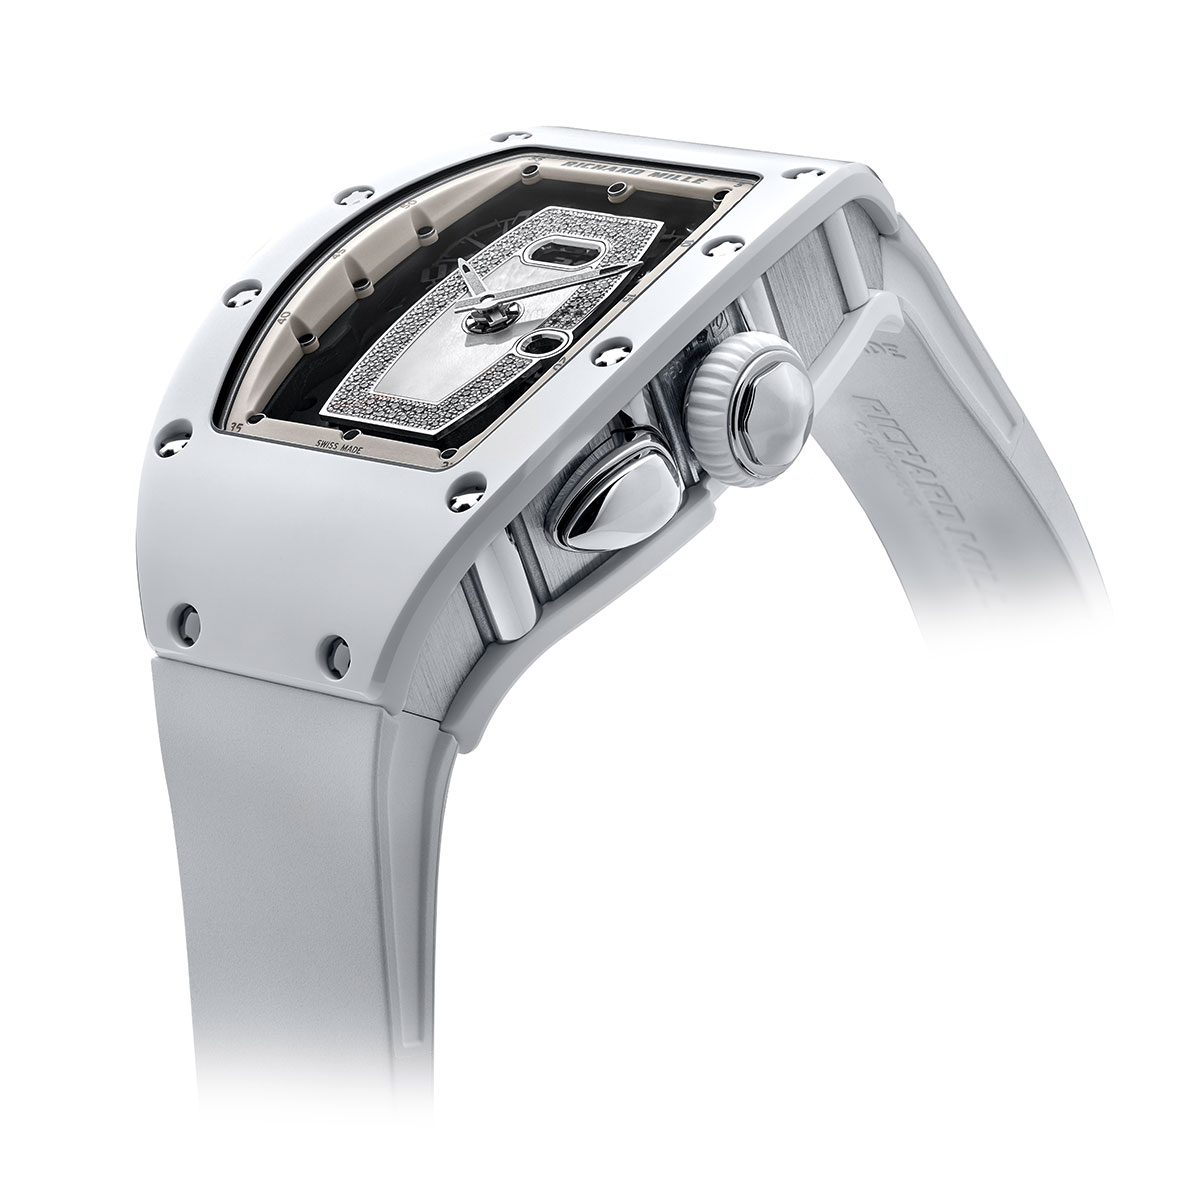 Đồng hồ Richard Mille RM 037 White Ceramic Automatic - 2